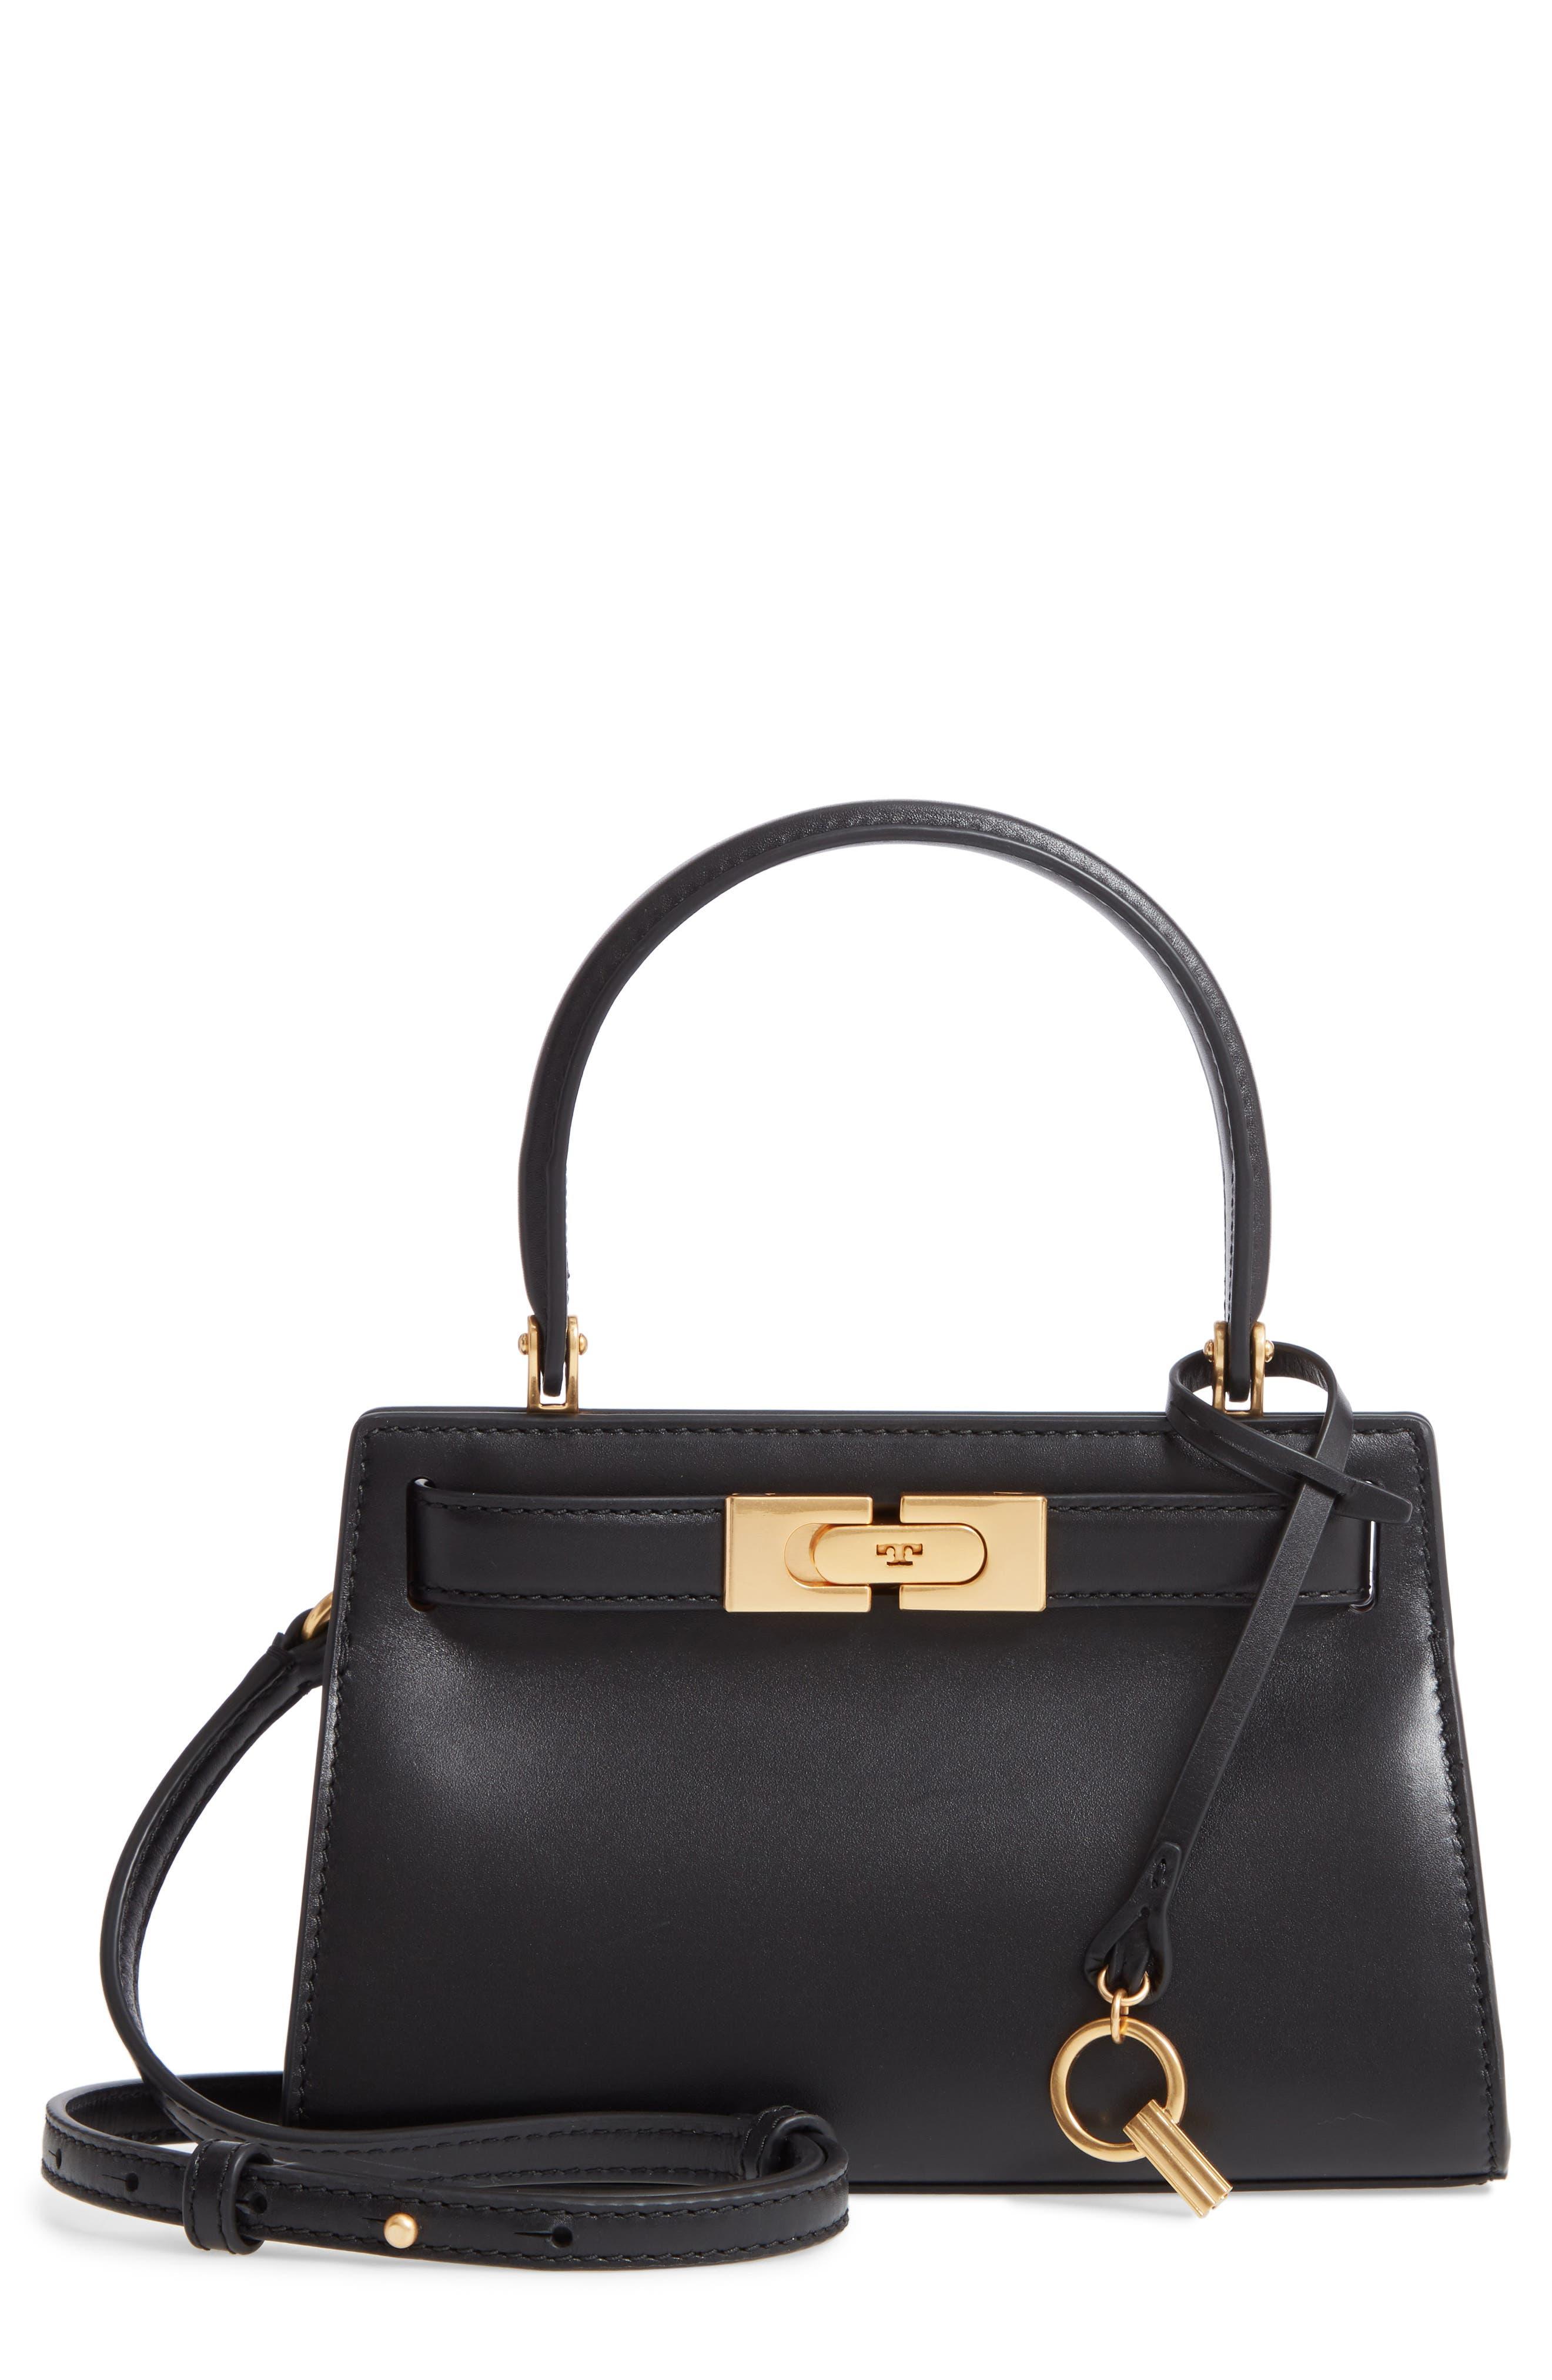 TORY BURCH Mini Lee Radziwill Leather Bag, Main, color, BLACK